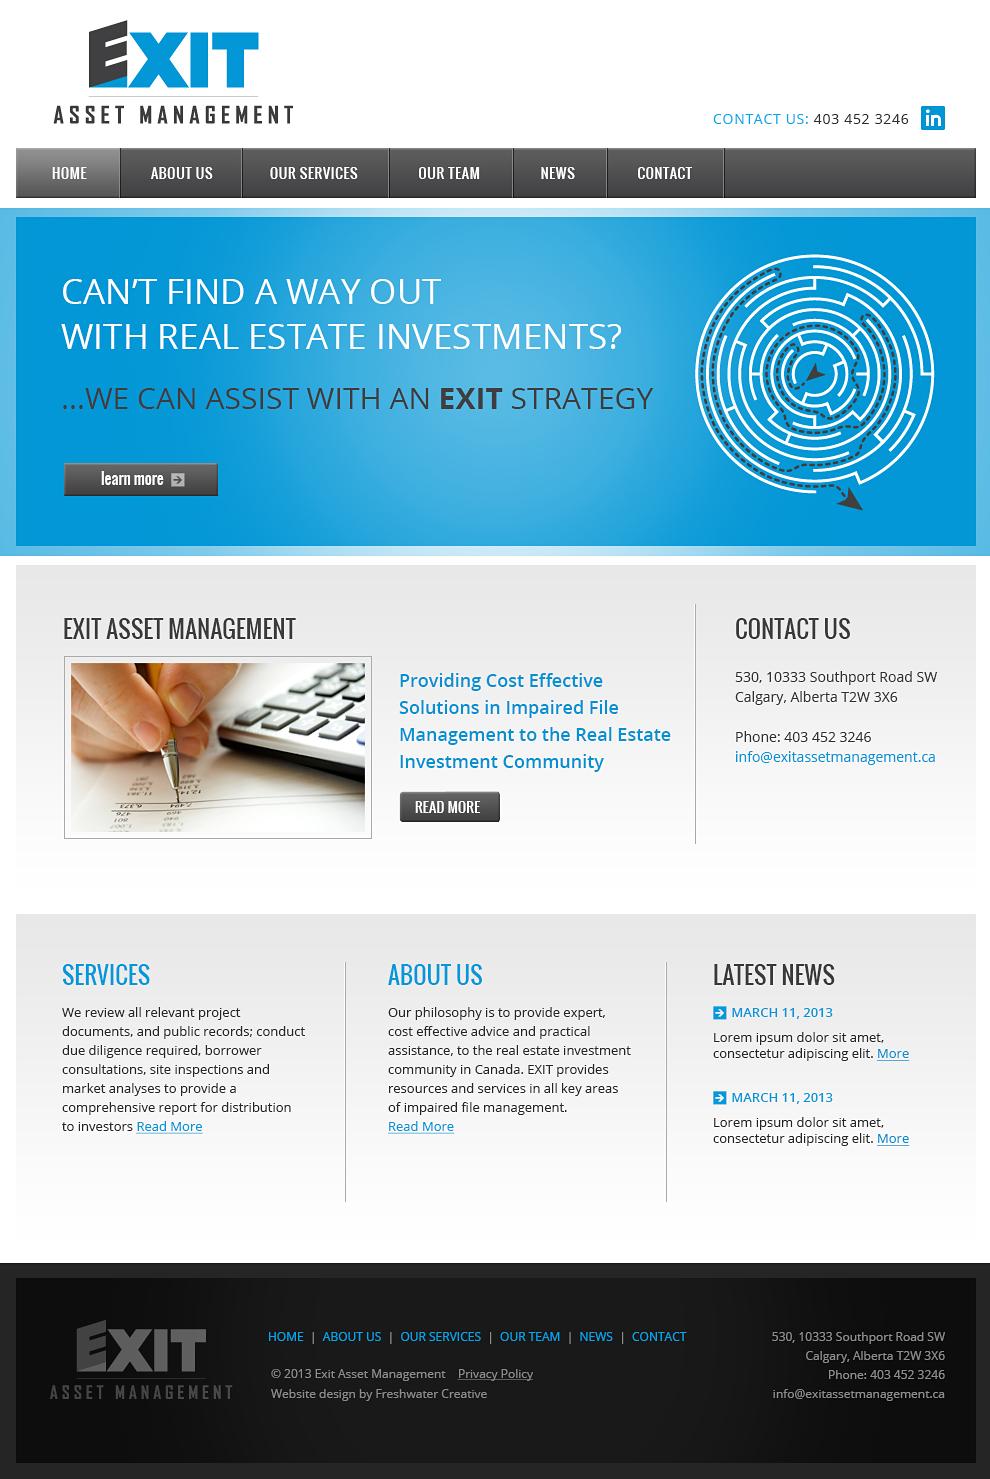 Exit Asset Management Homepage Design